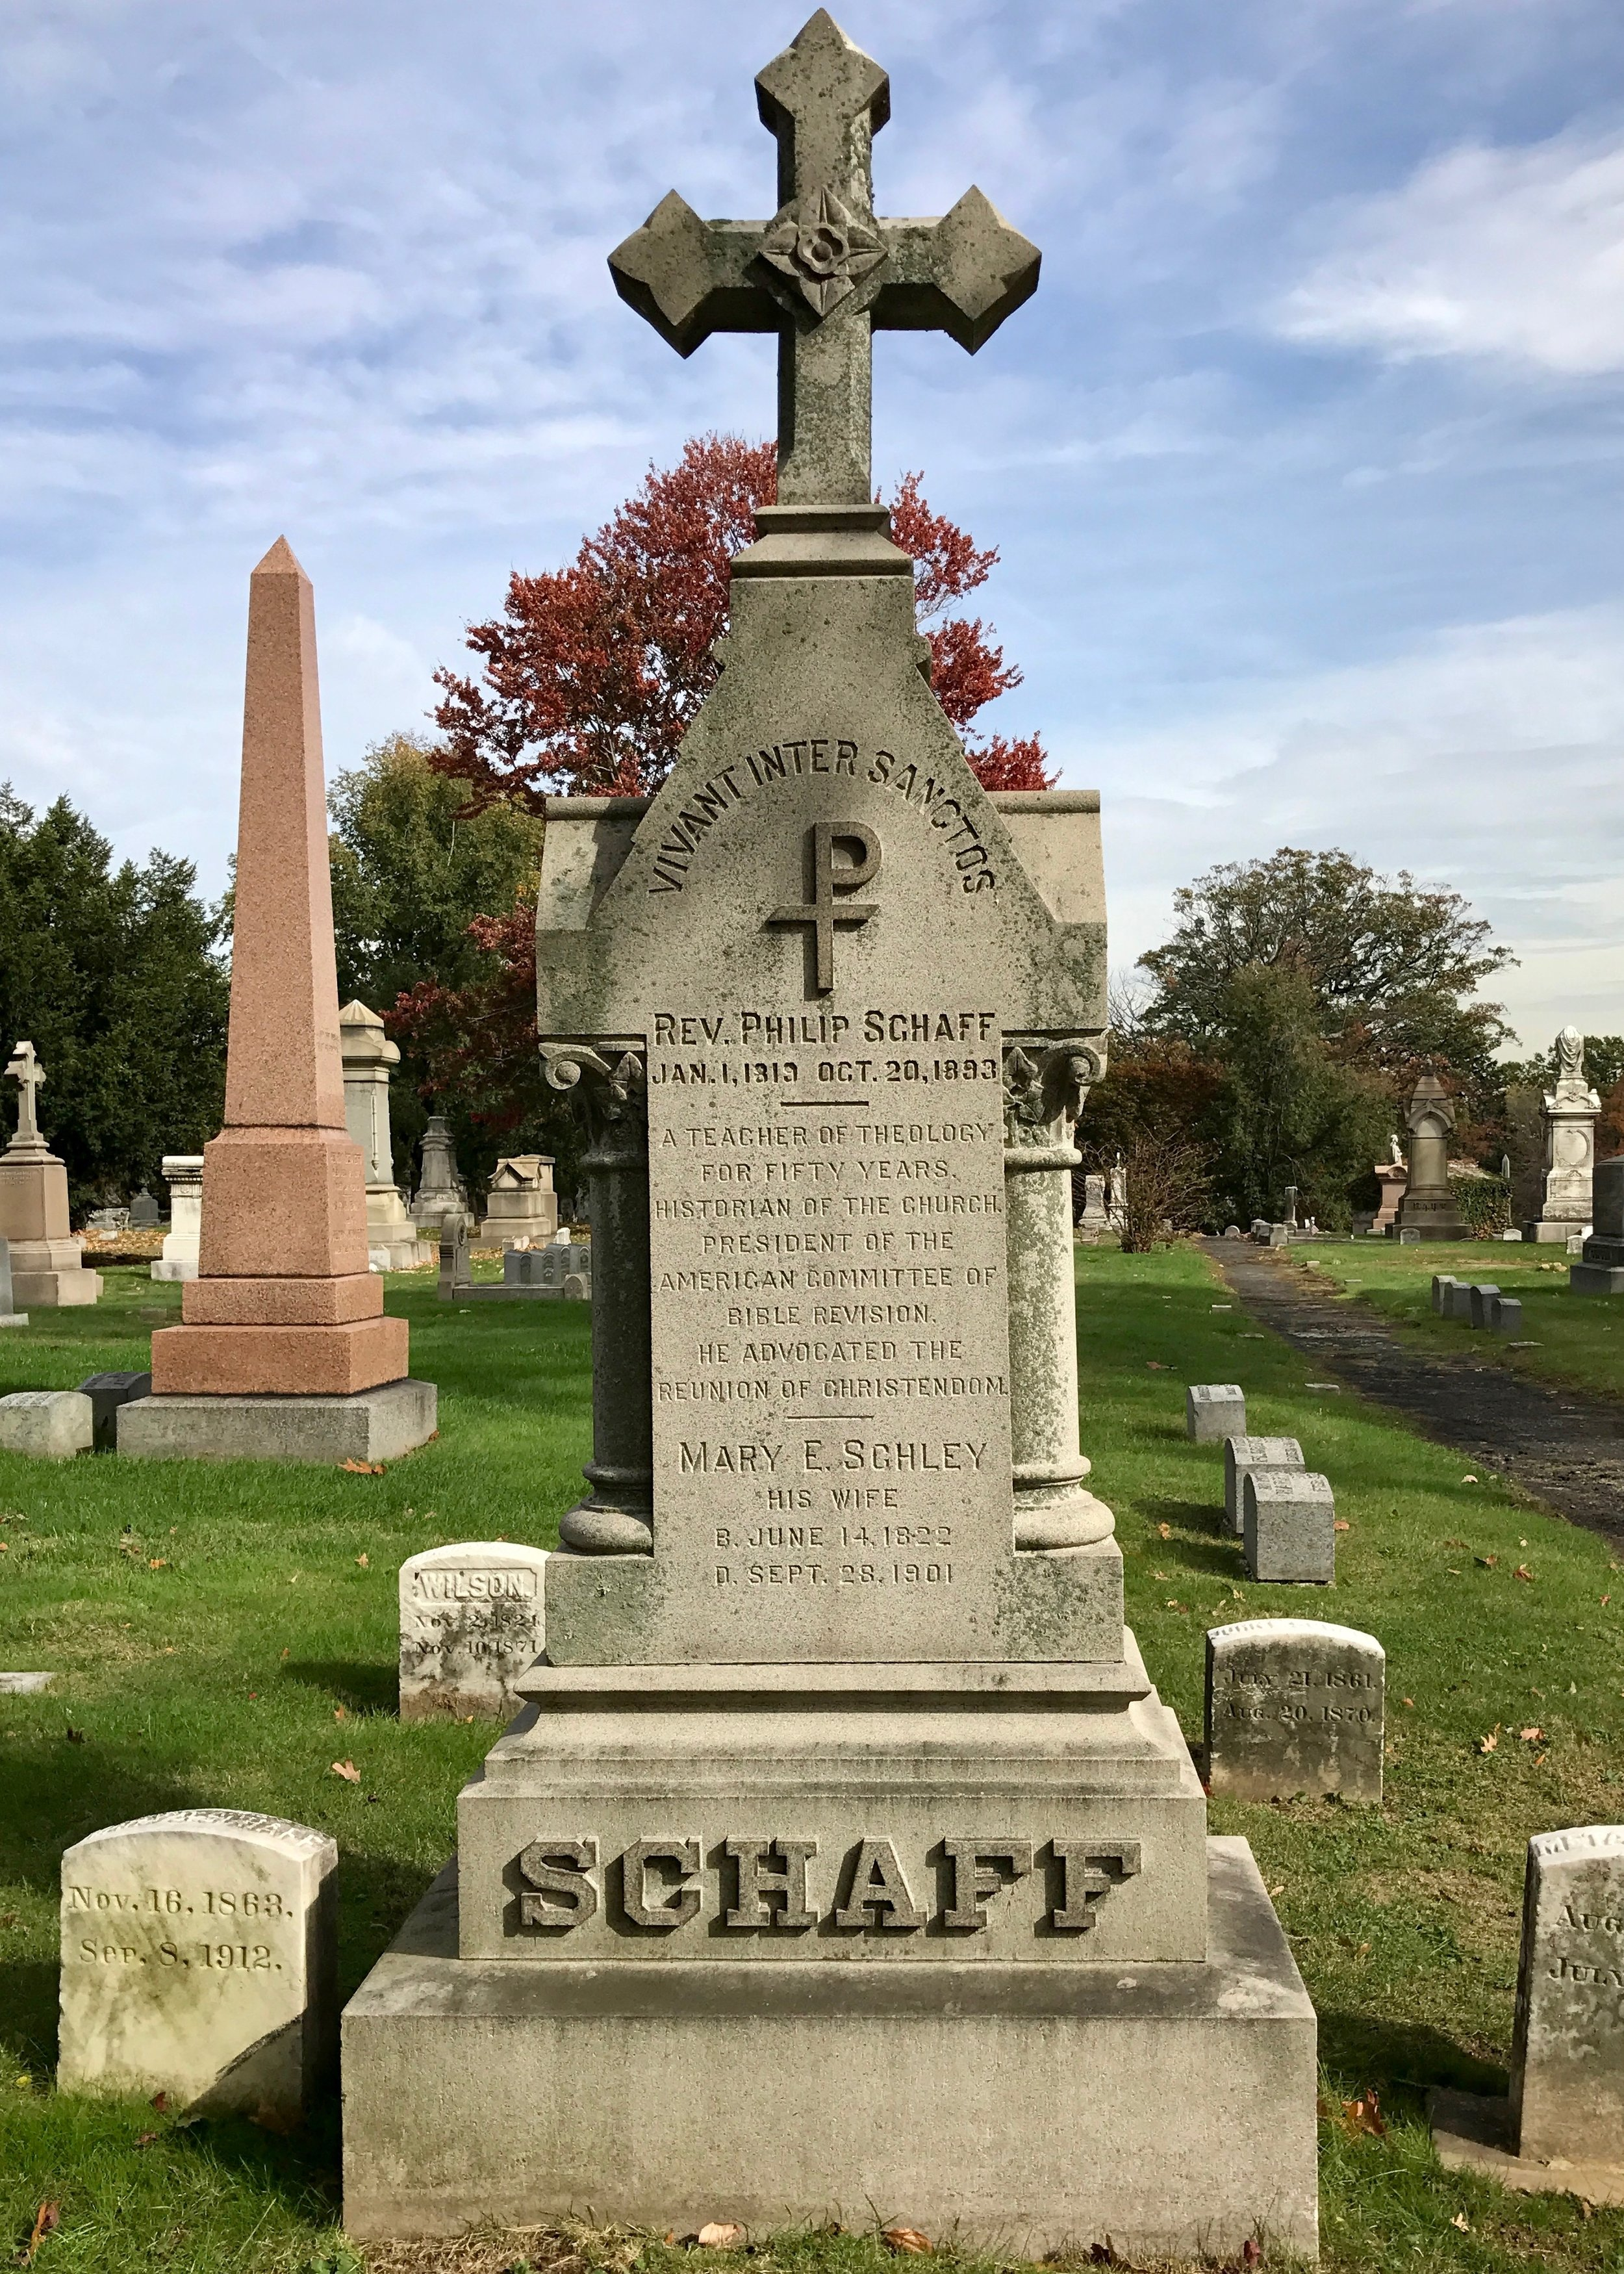 Philip Schaff is buried at Woodlawn Cemetery, Bronx, New York.